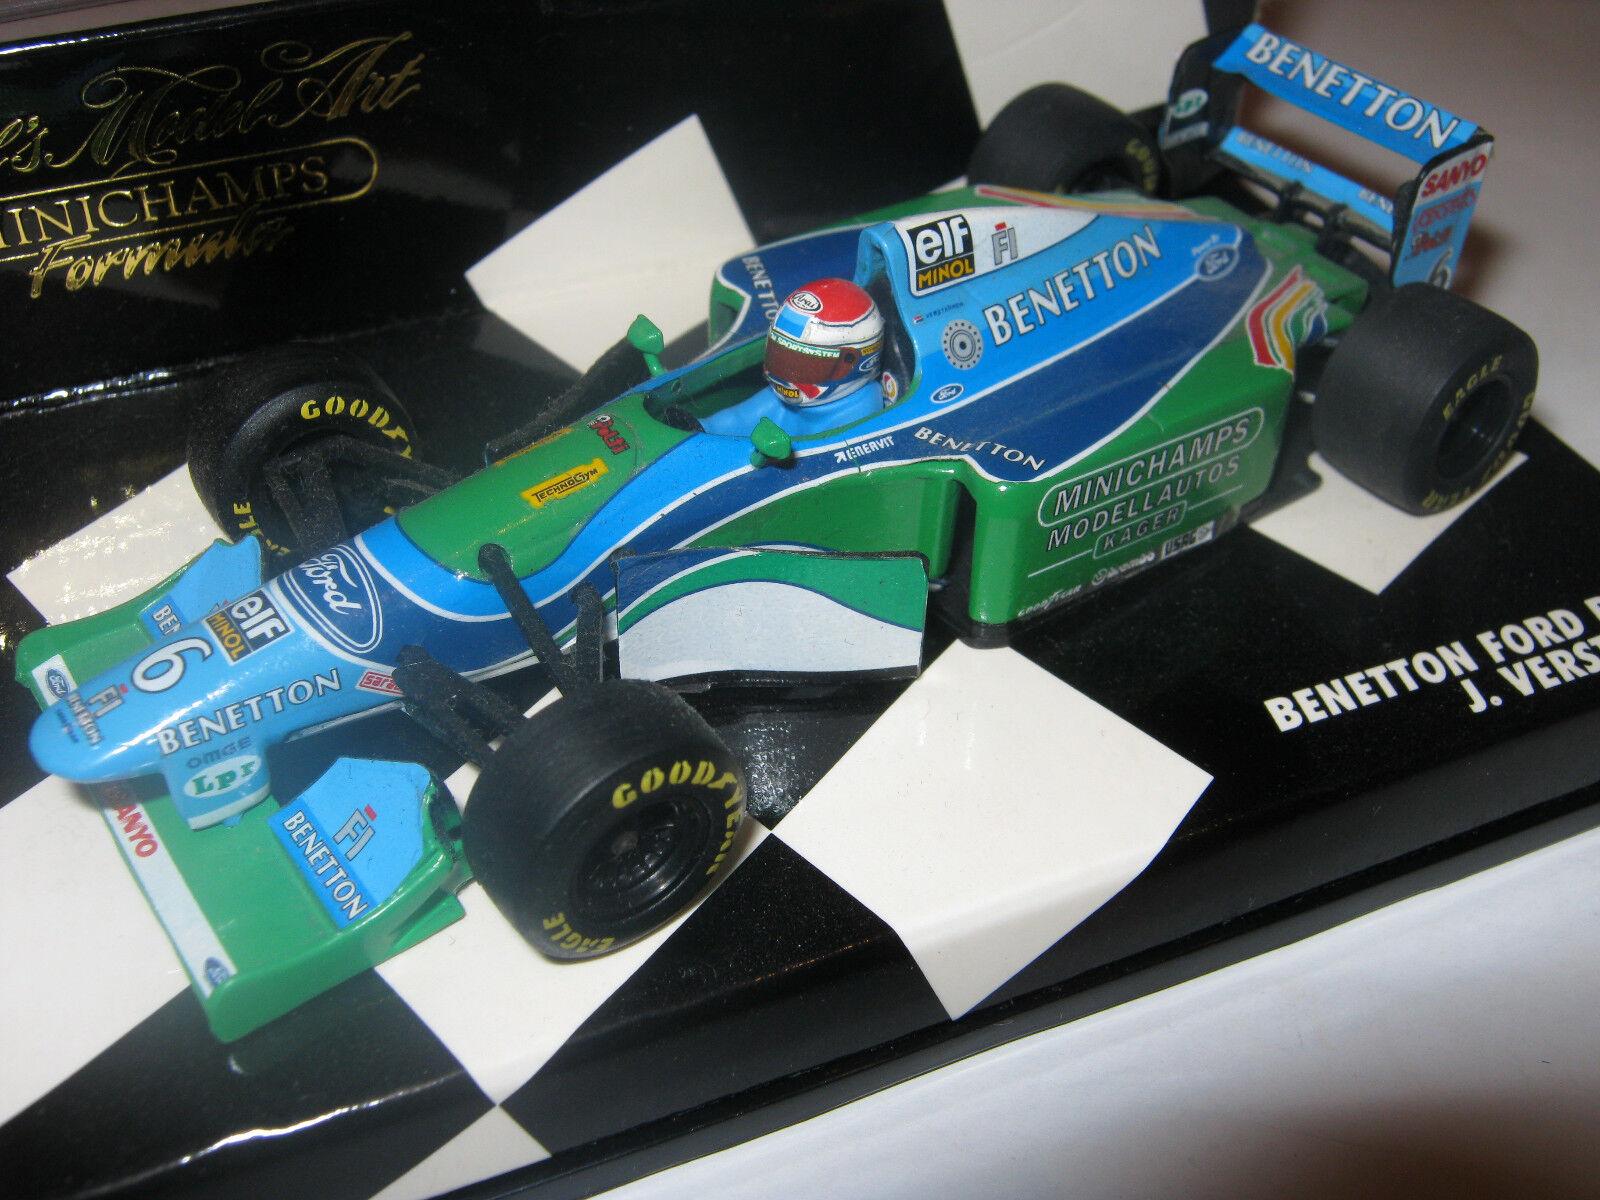 1 43 Benetton FORD b194 J. Verstappen German GP 1994 MINICHAMPS 430940206 neuf dans sa boîte